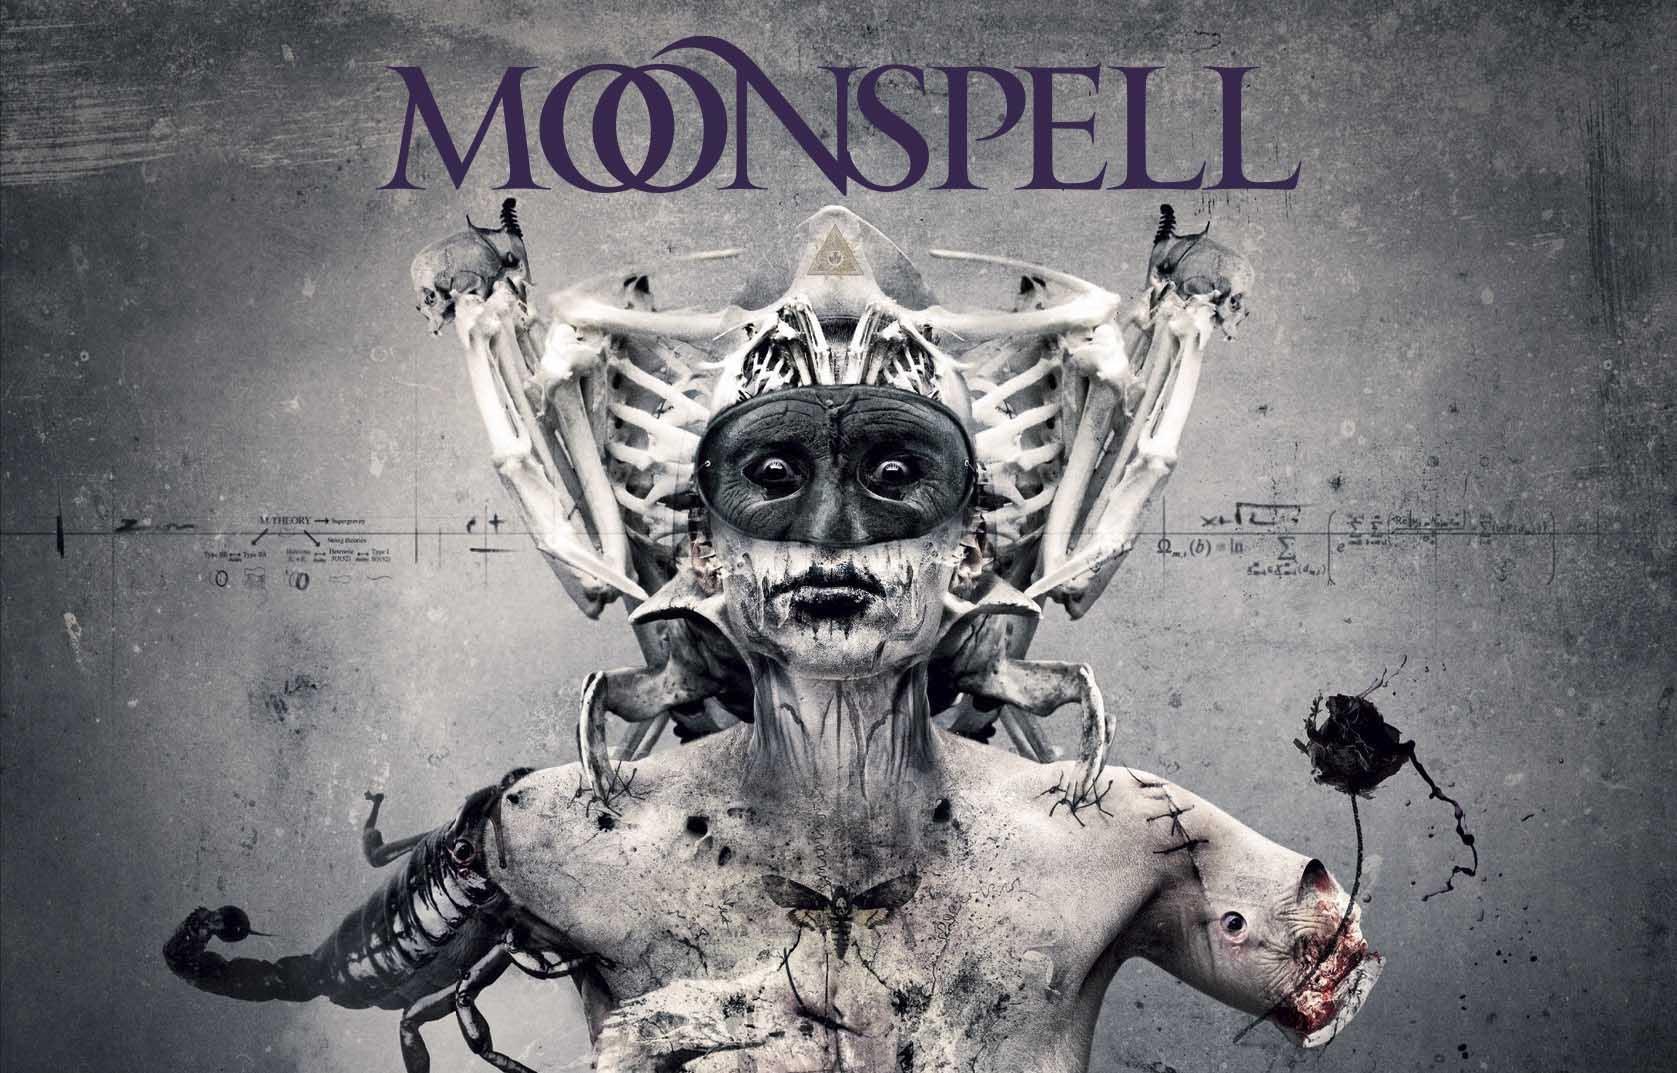 Gira española de Moonspell y Septic Flesh